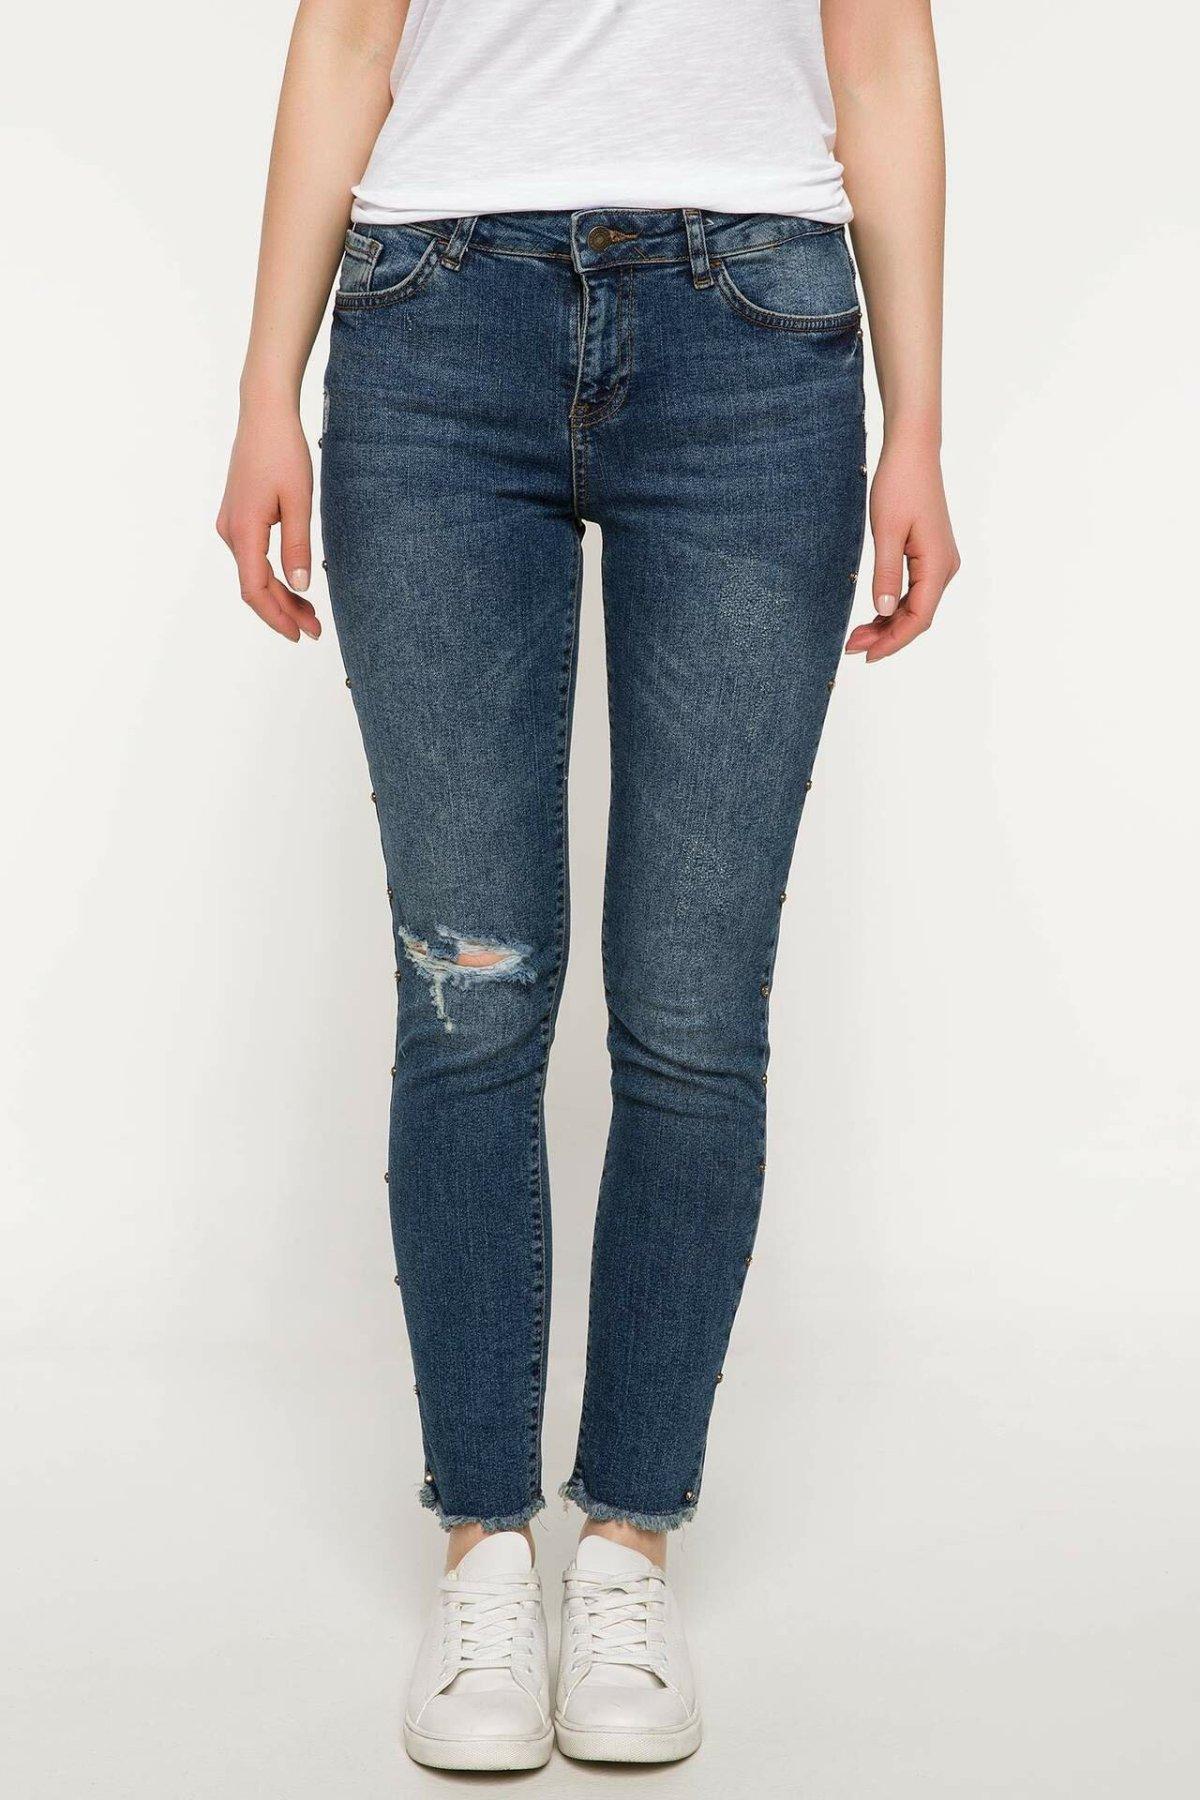 DeFacto Blue Lady Skinny Jeans Denim Hole Casual Mid-waist Denim Stretch Simple Nine Minutes Trousers Trousers-J0462AZ18SM